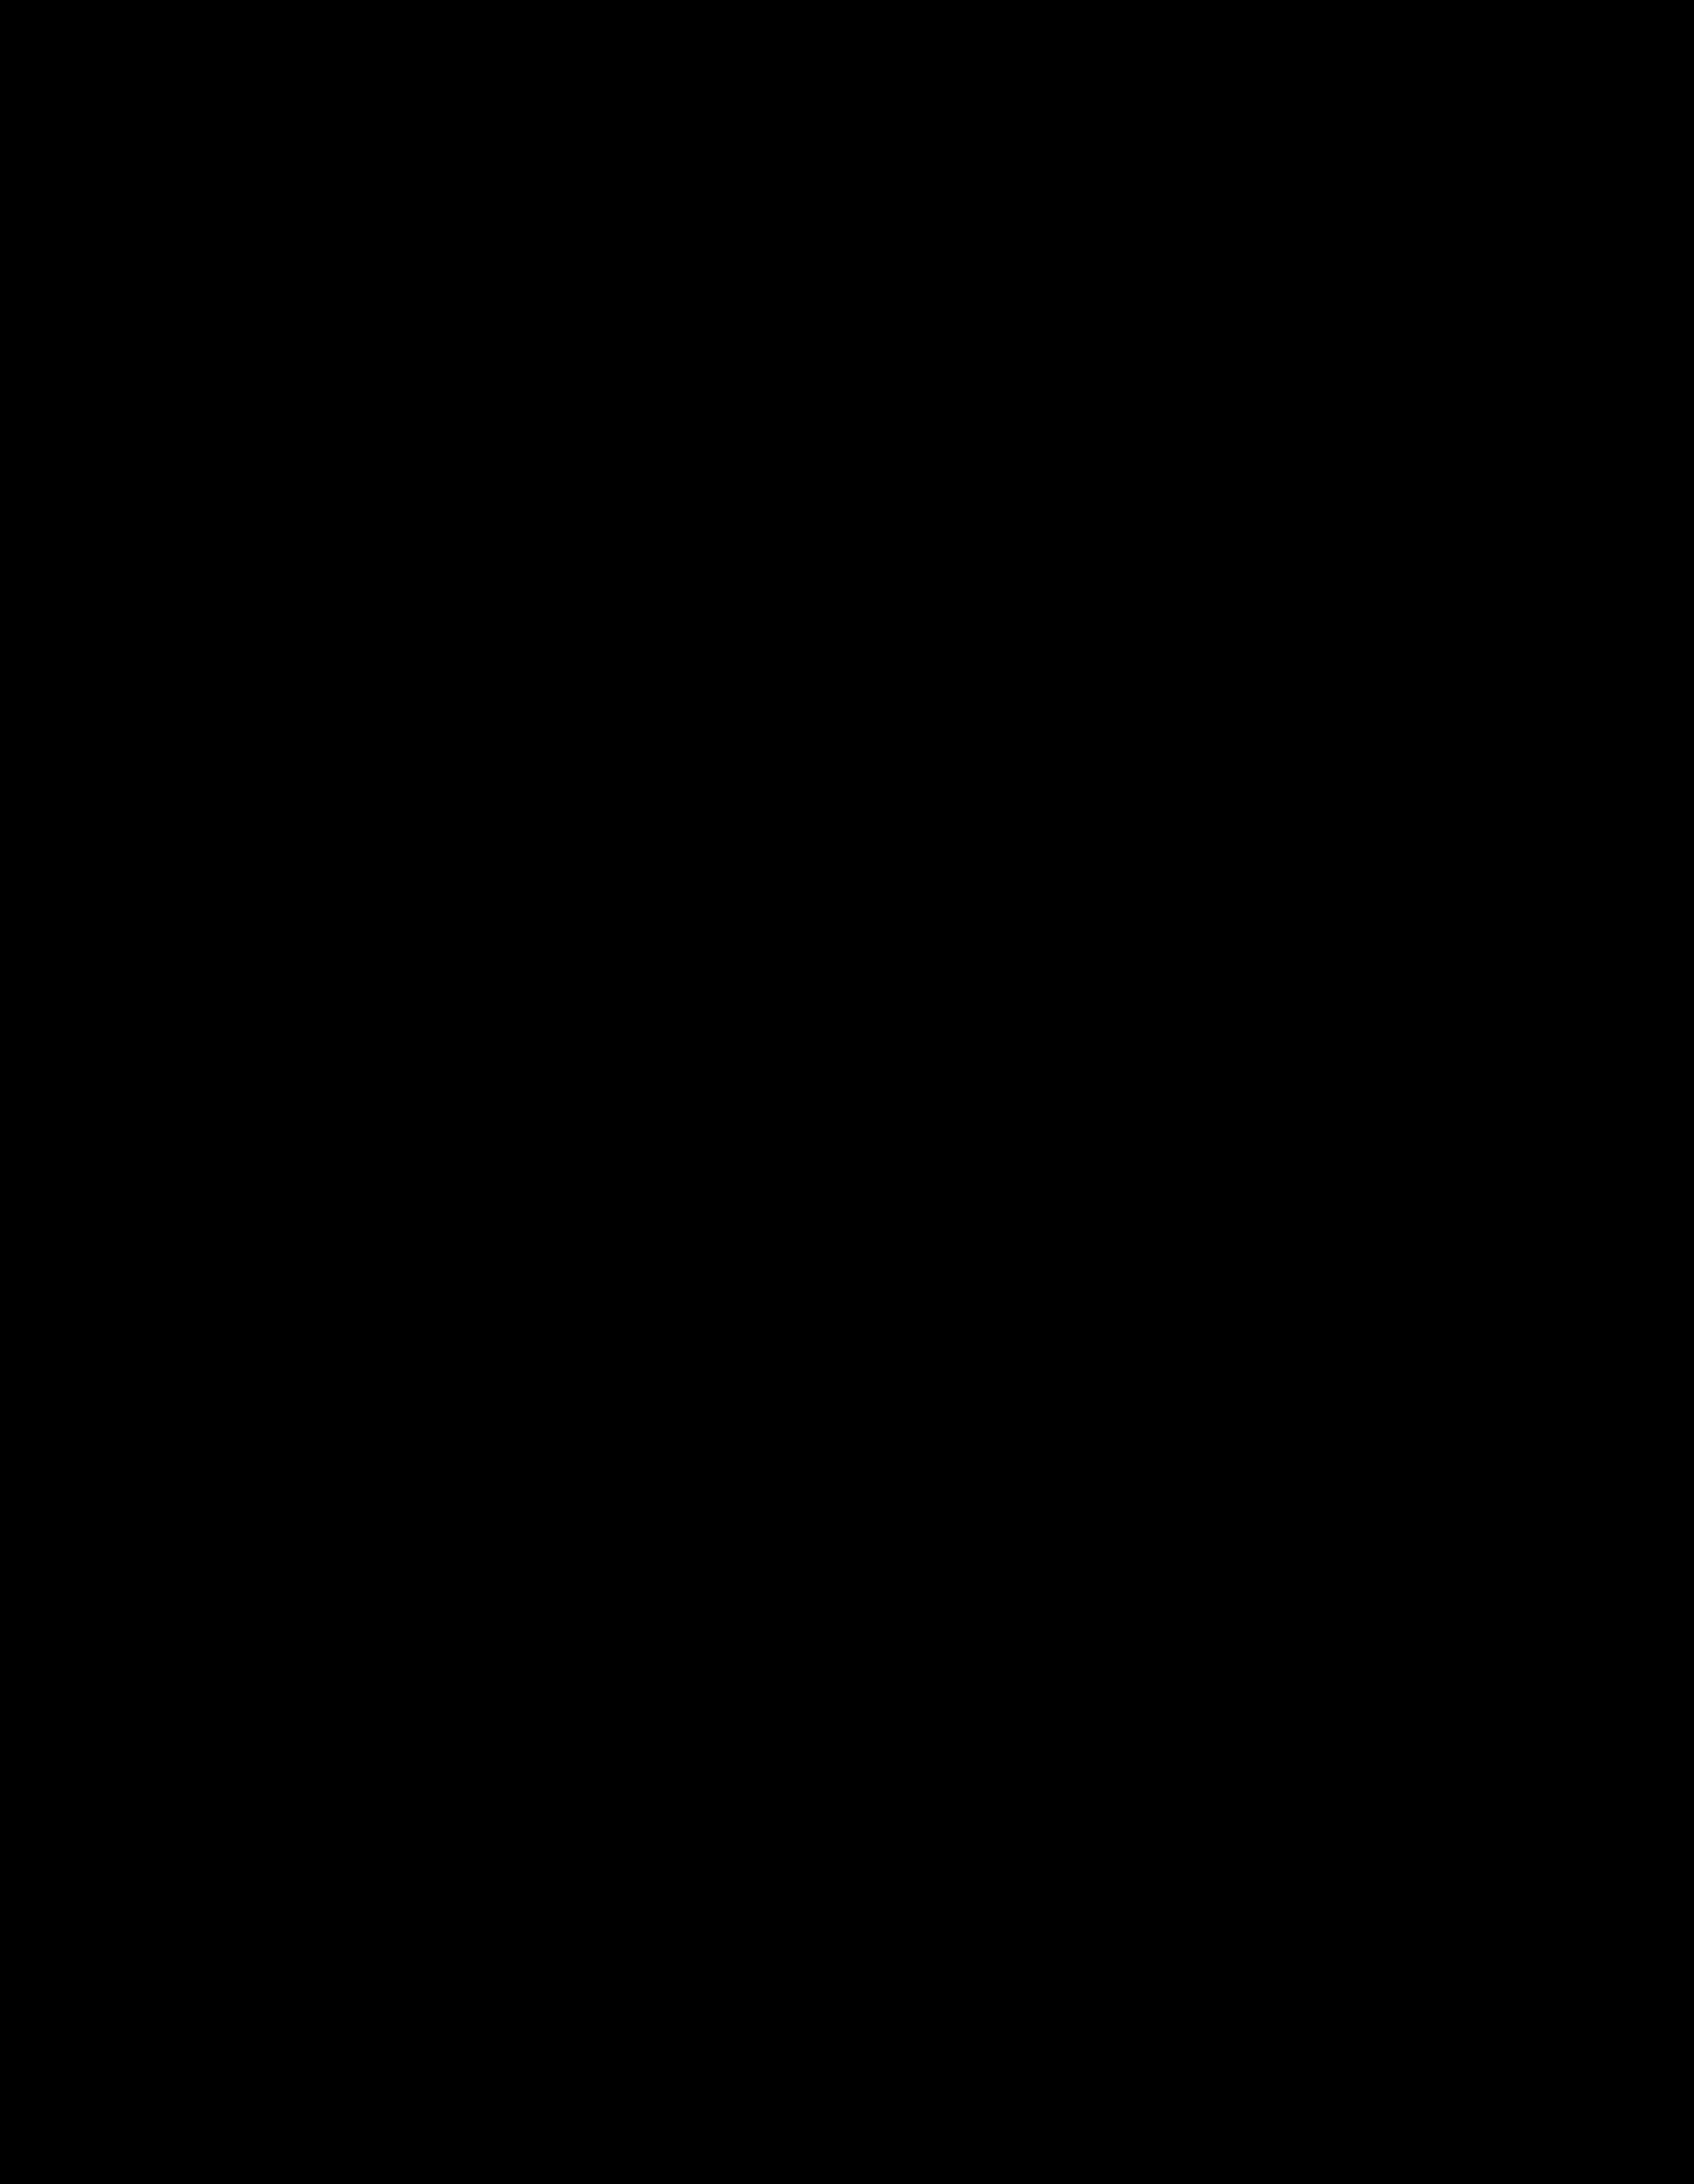 Black Family Silhouette Clip Art.